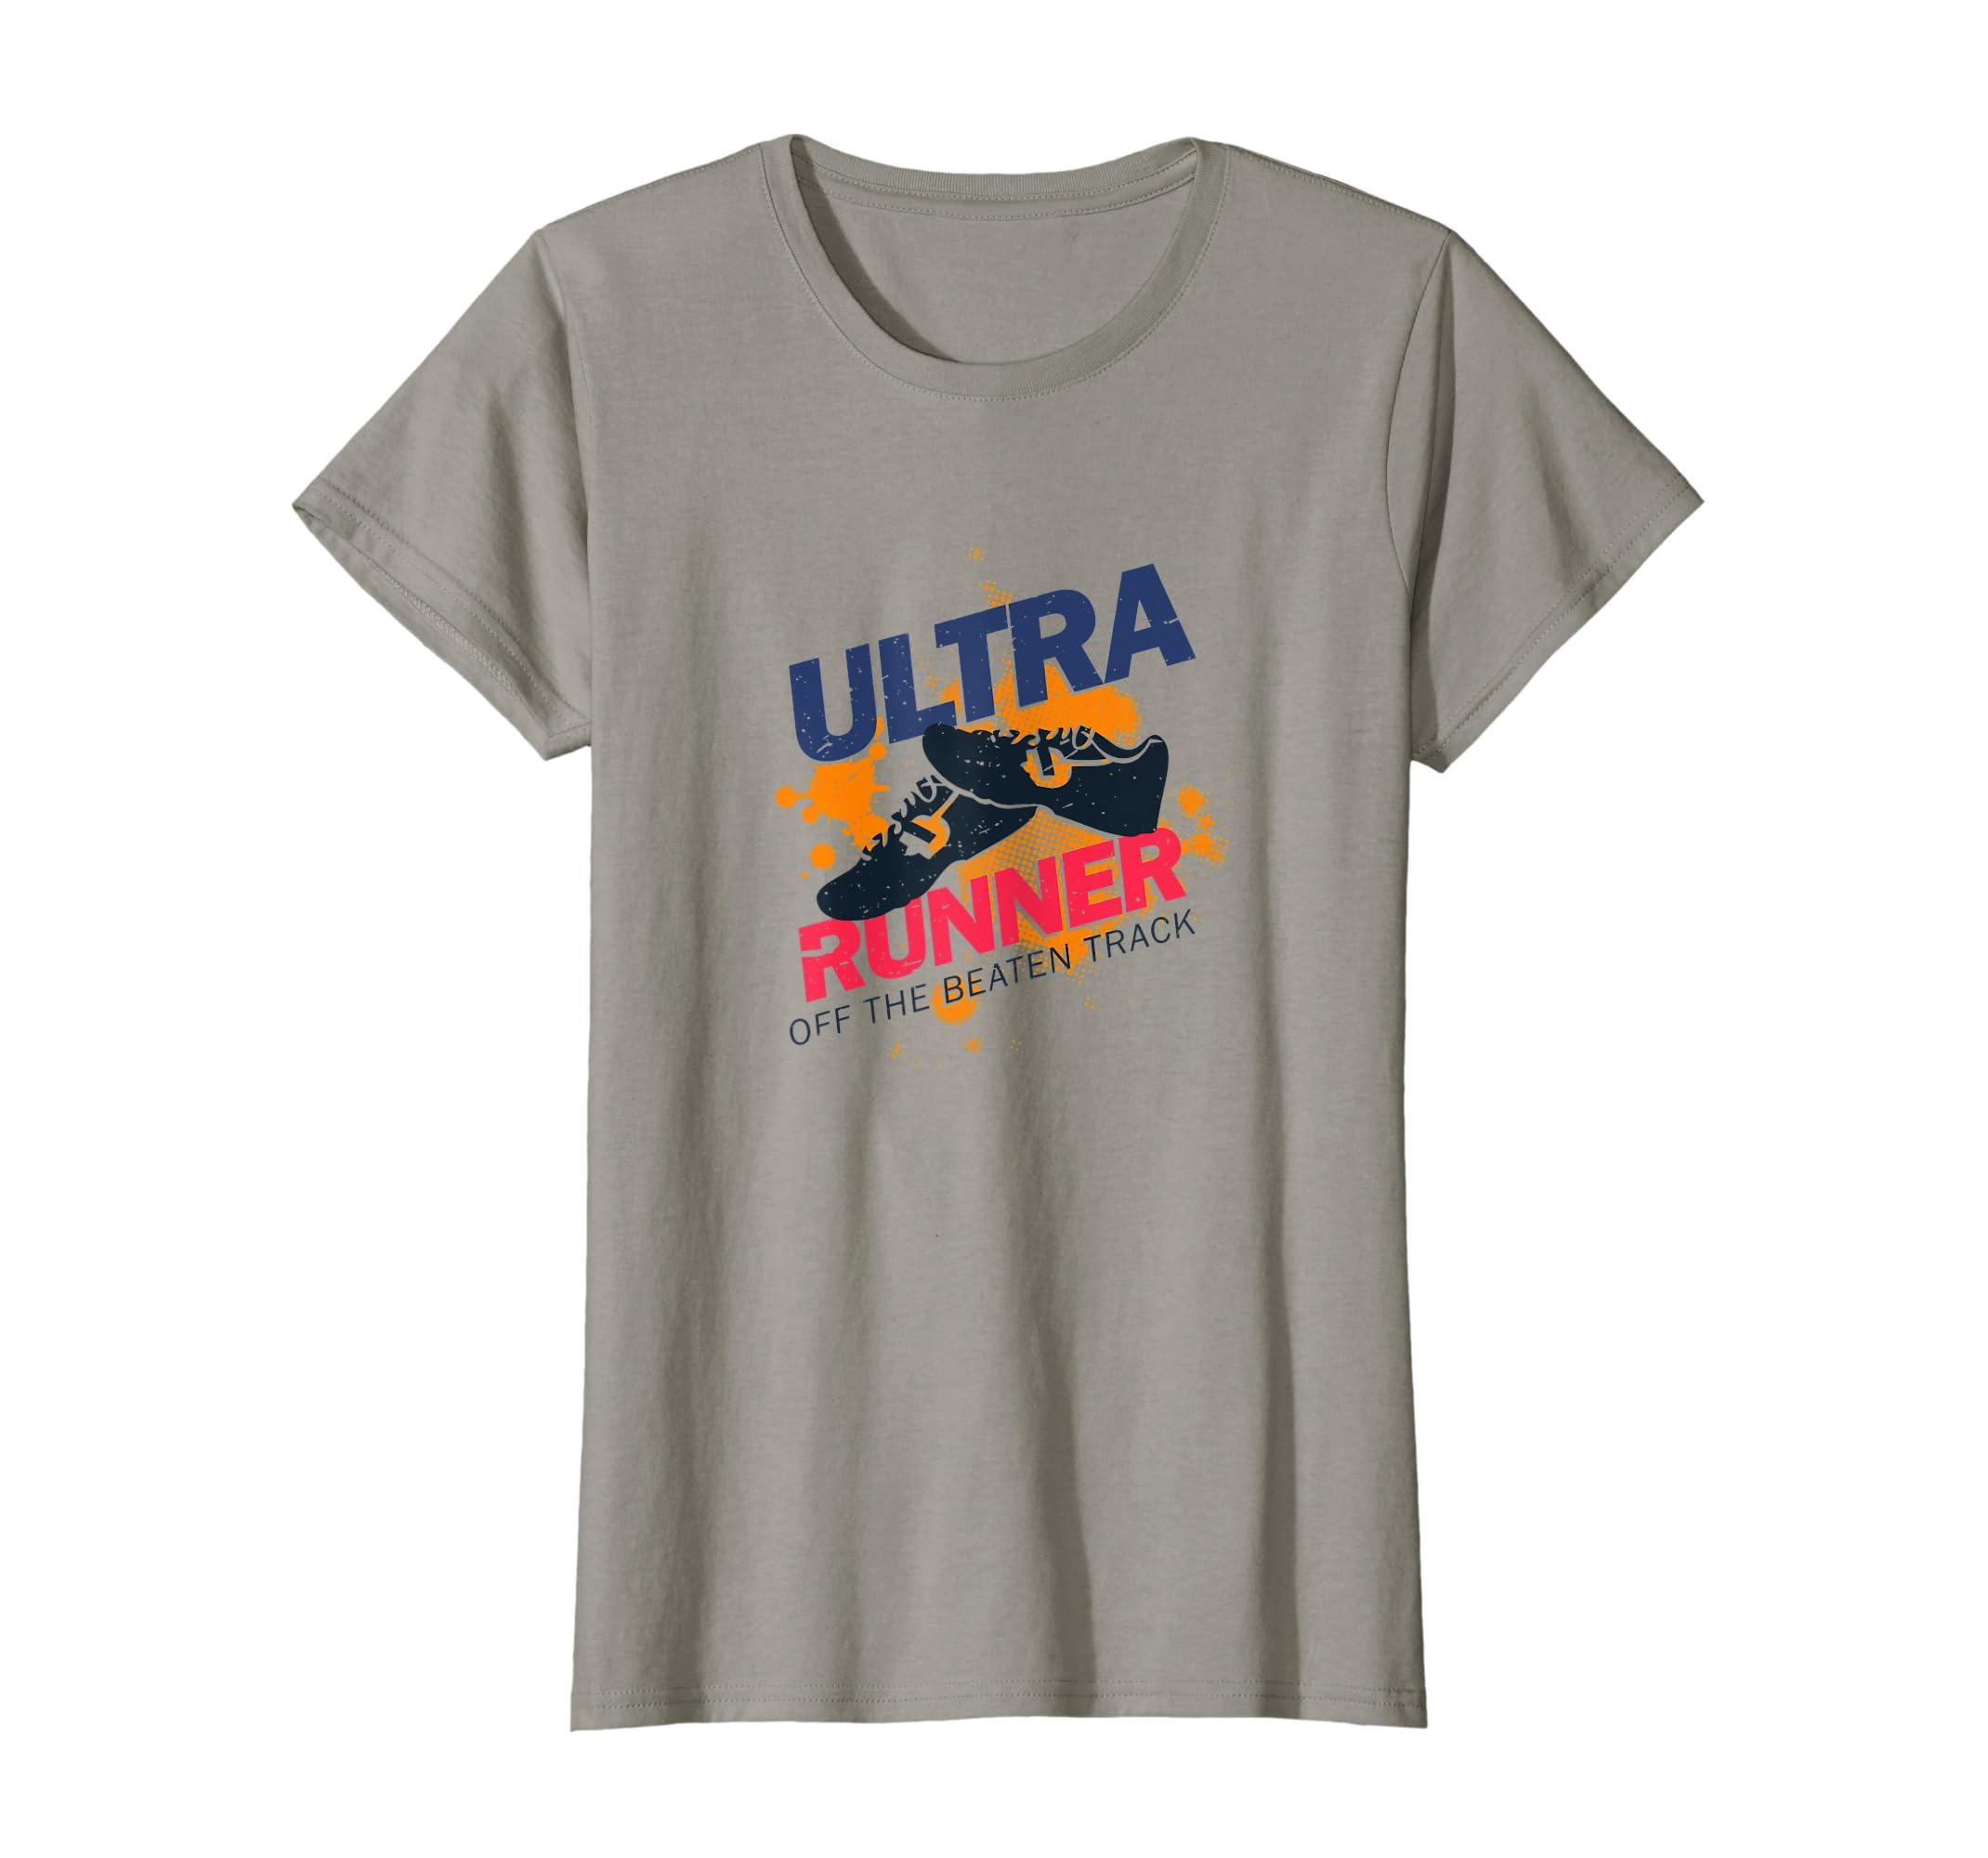 09b141ed1f38 Amazon.com  Ultra Runner T-Shirt